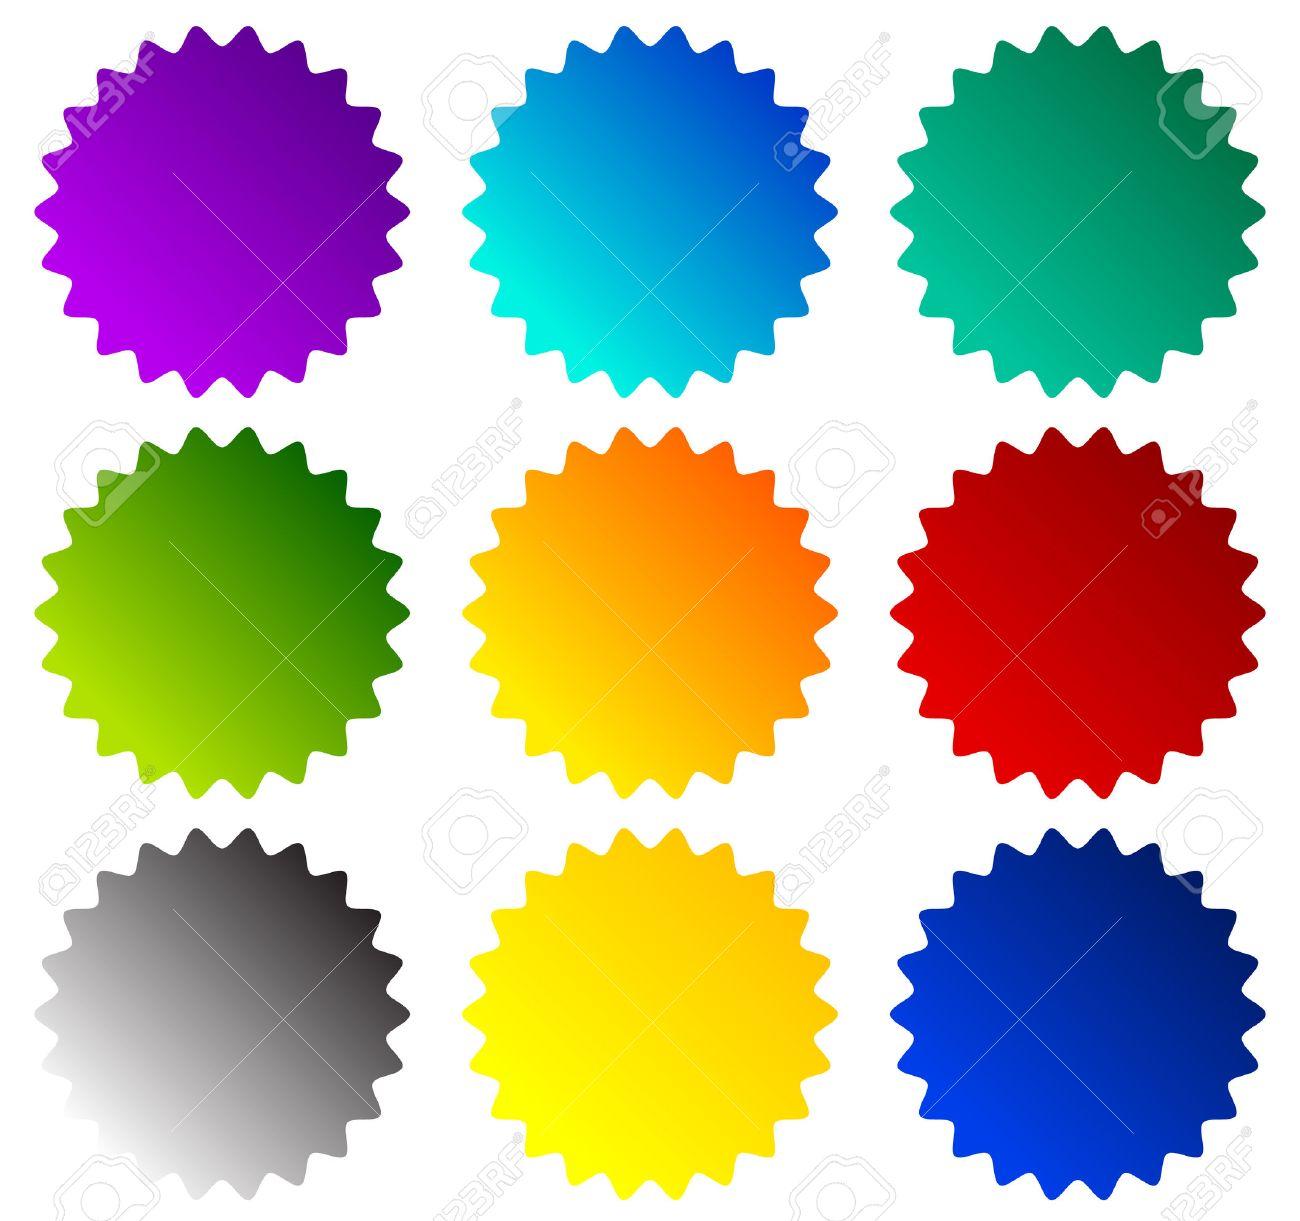 Badge, starburst, price flash shapes. Vector illustration. - 51225102